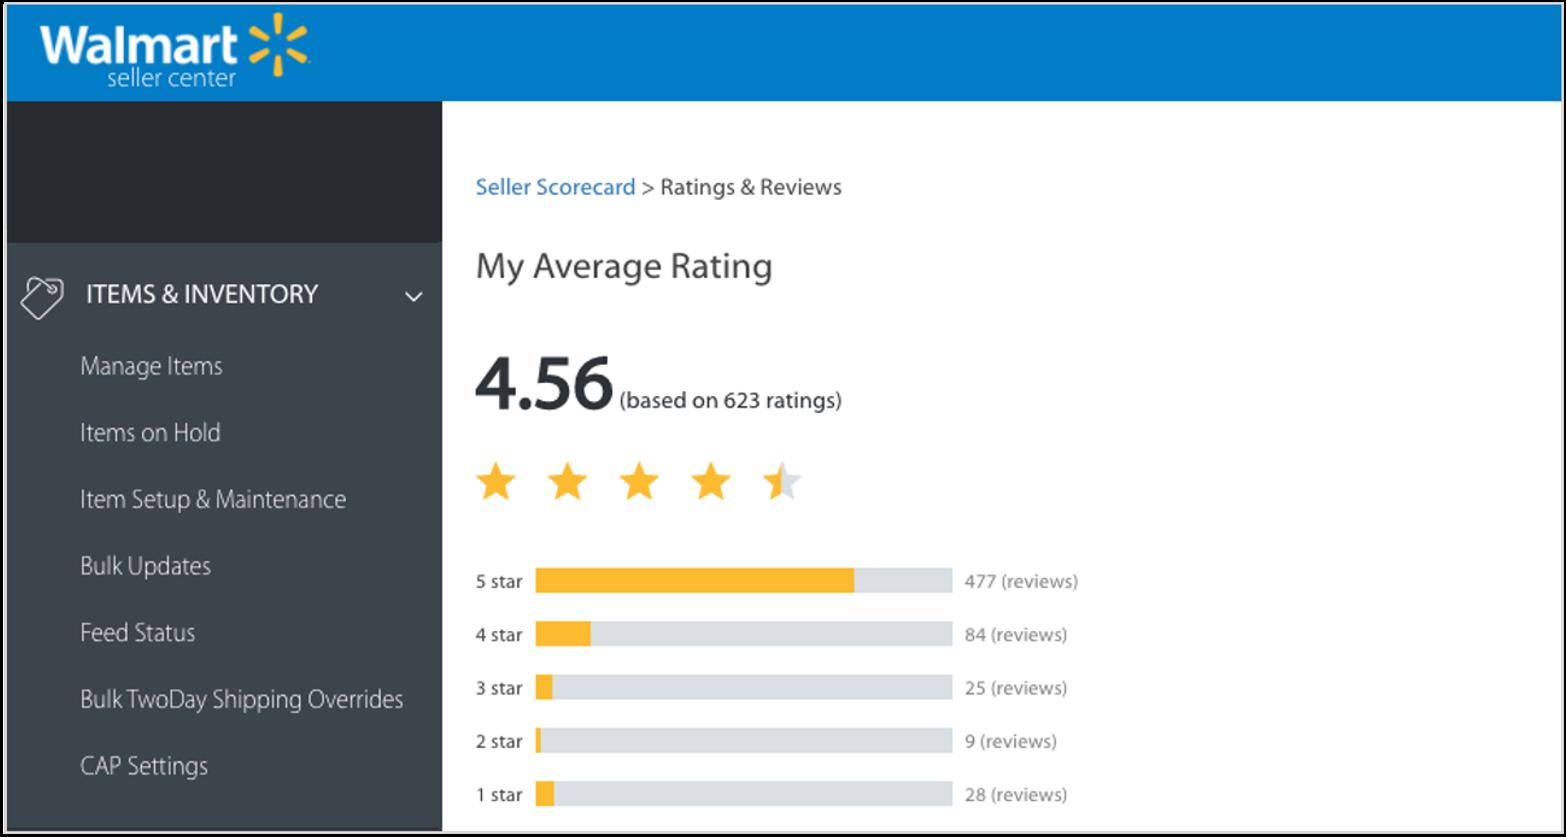 screenshot of seller scorecard in walmart seller center